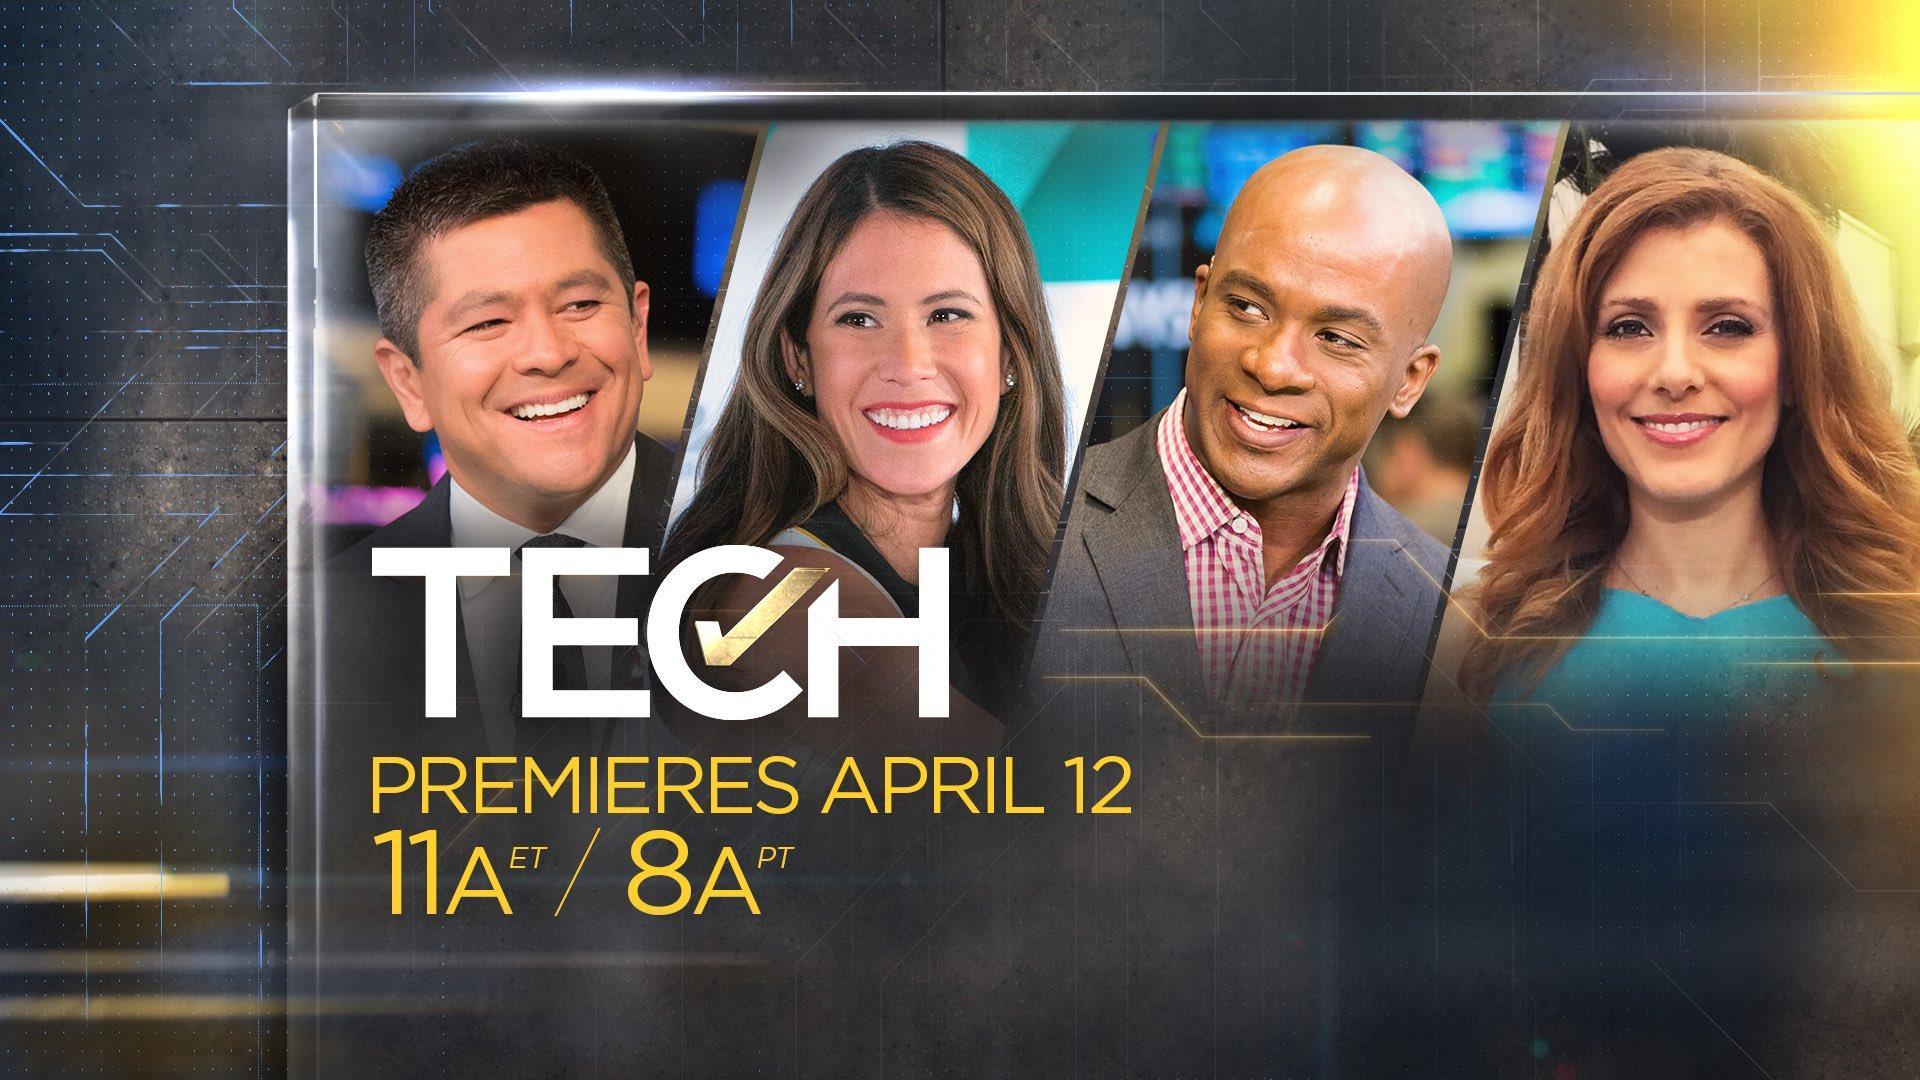 TechCheck hosts